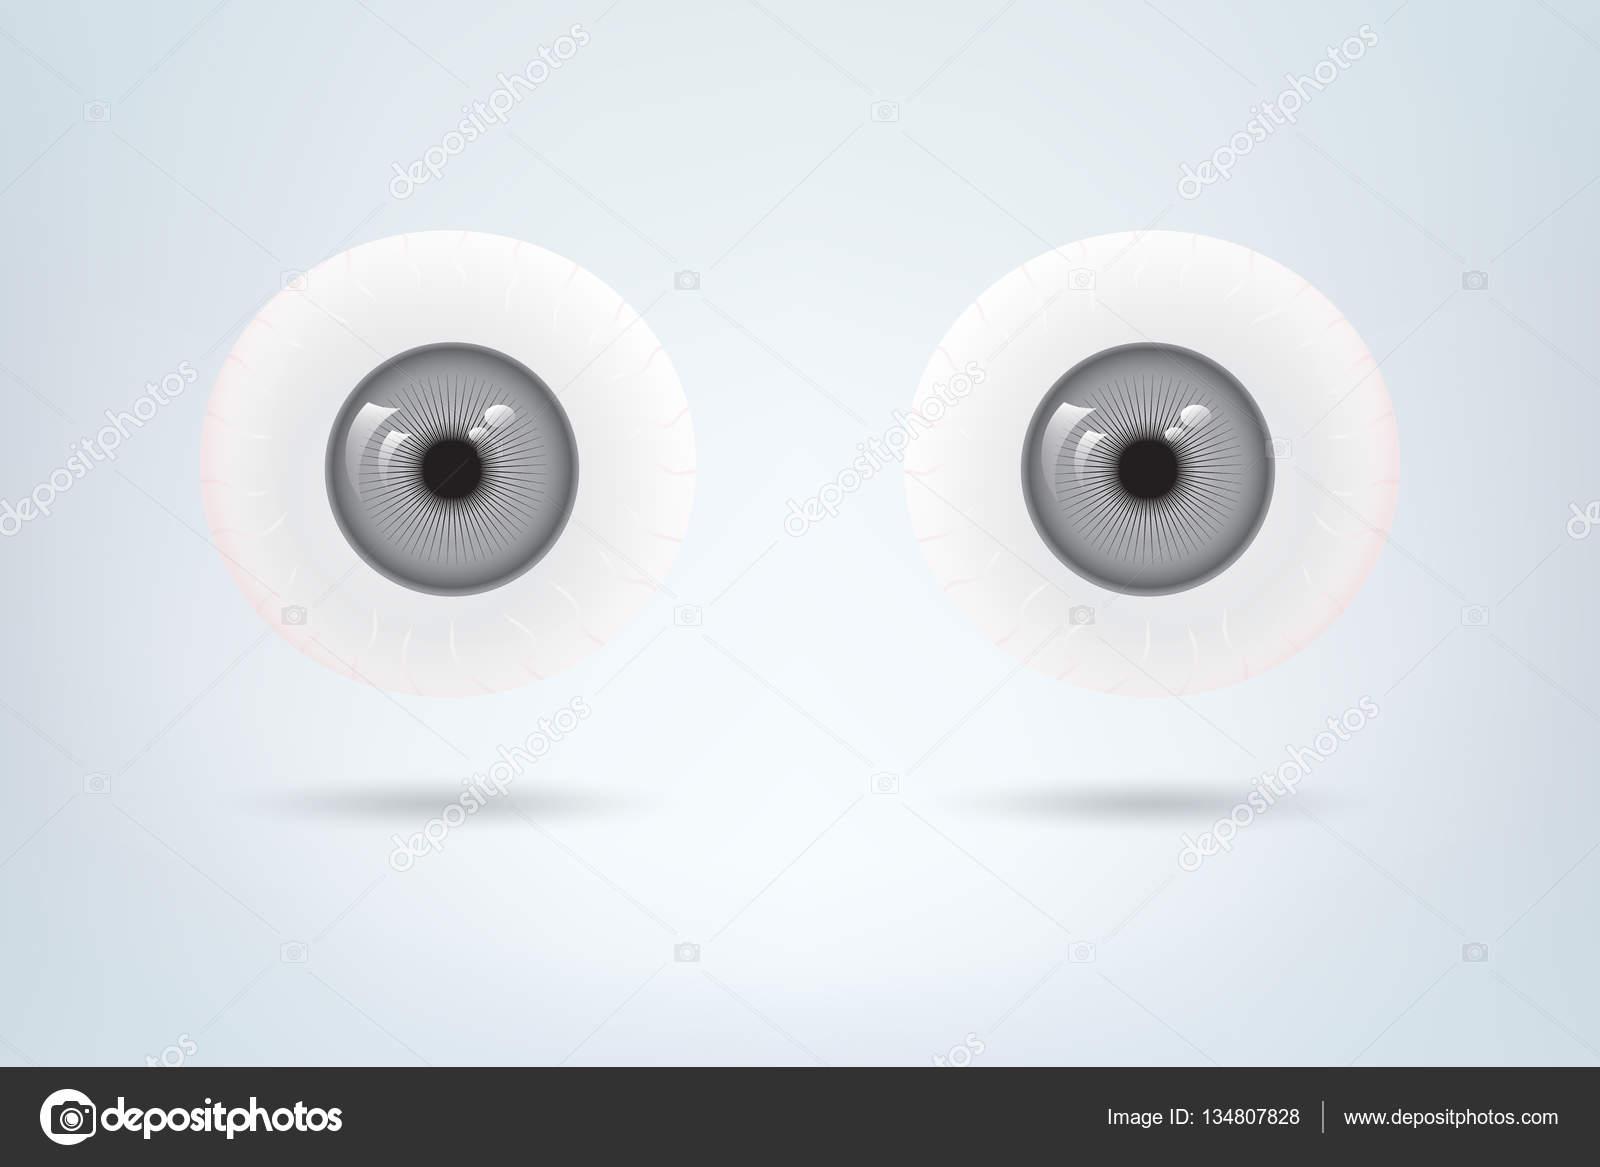 Menschlichen grauen Augen Kugeln Schüler. Medizinisches Bildmaterial ...